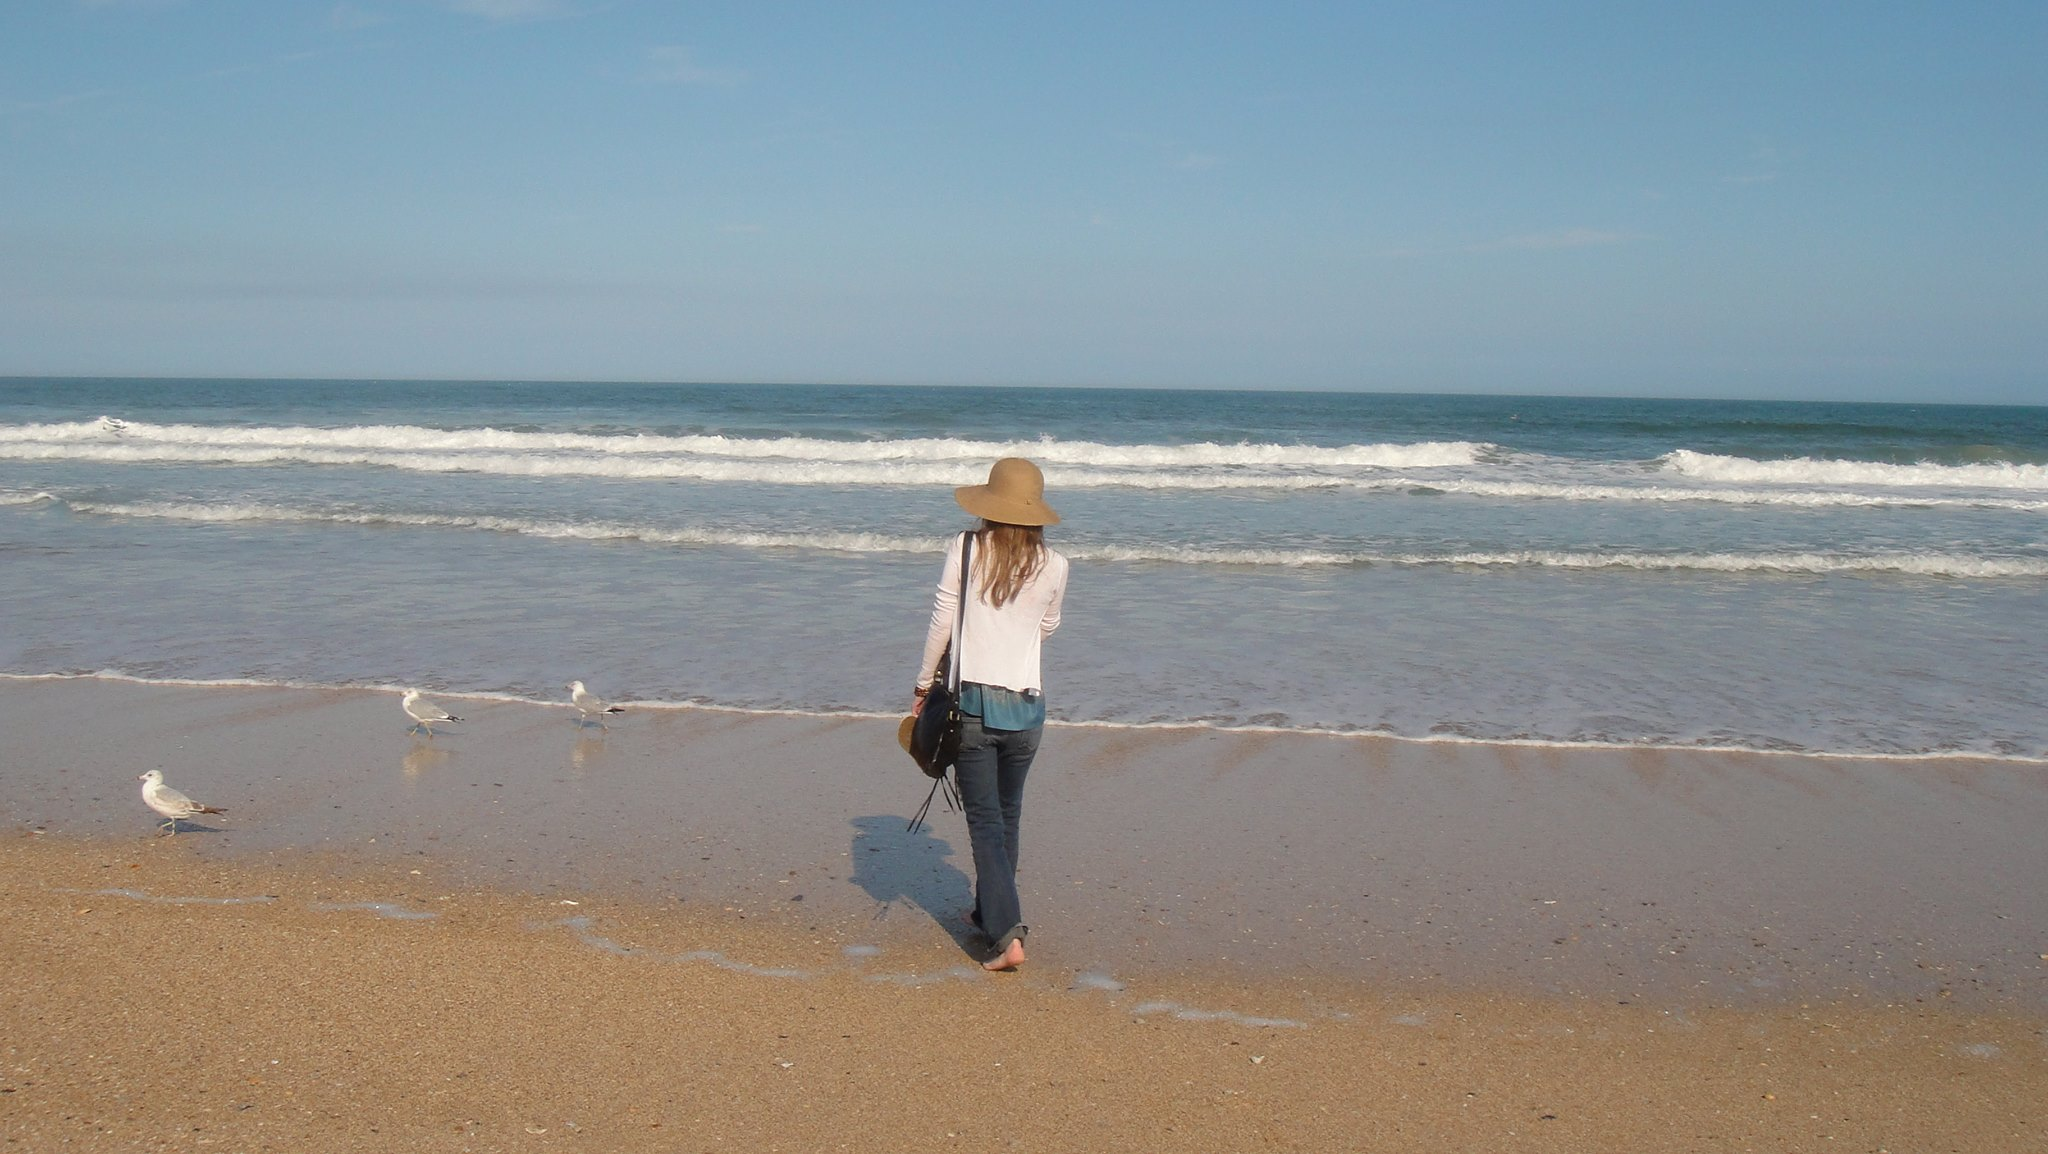 Author Priscilla Gilman on the beach